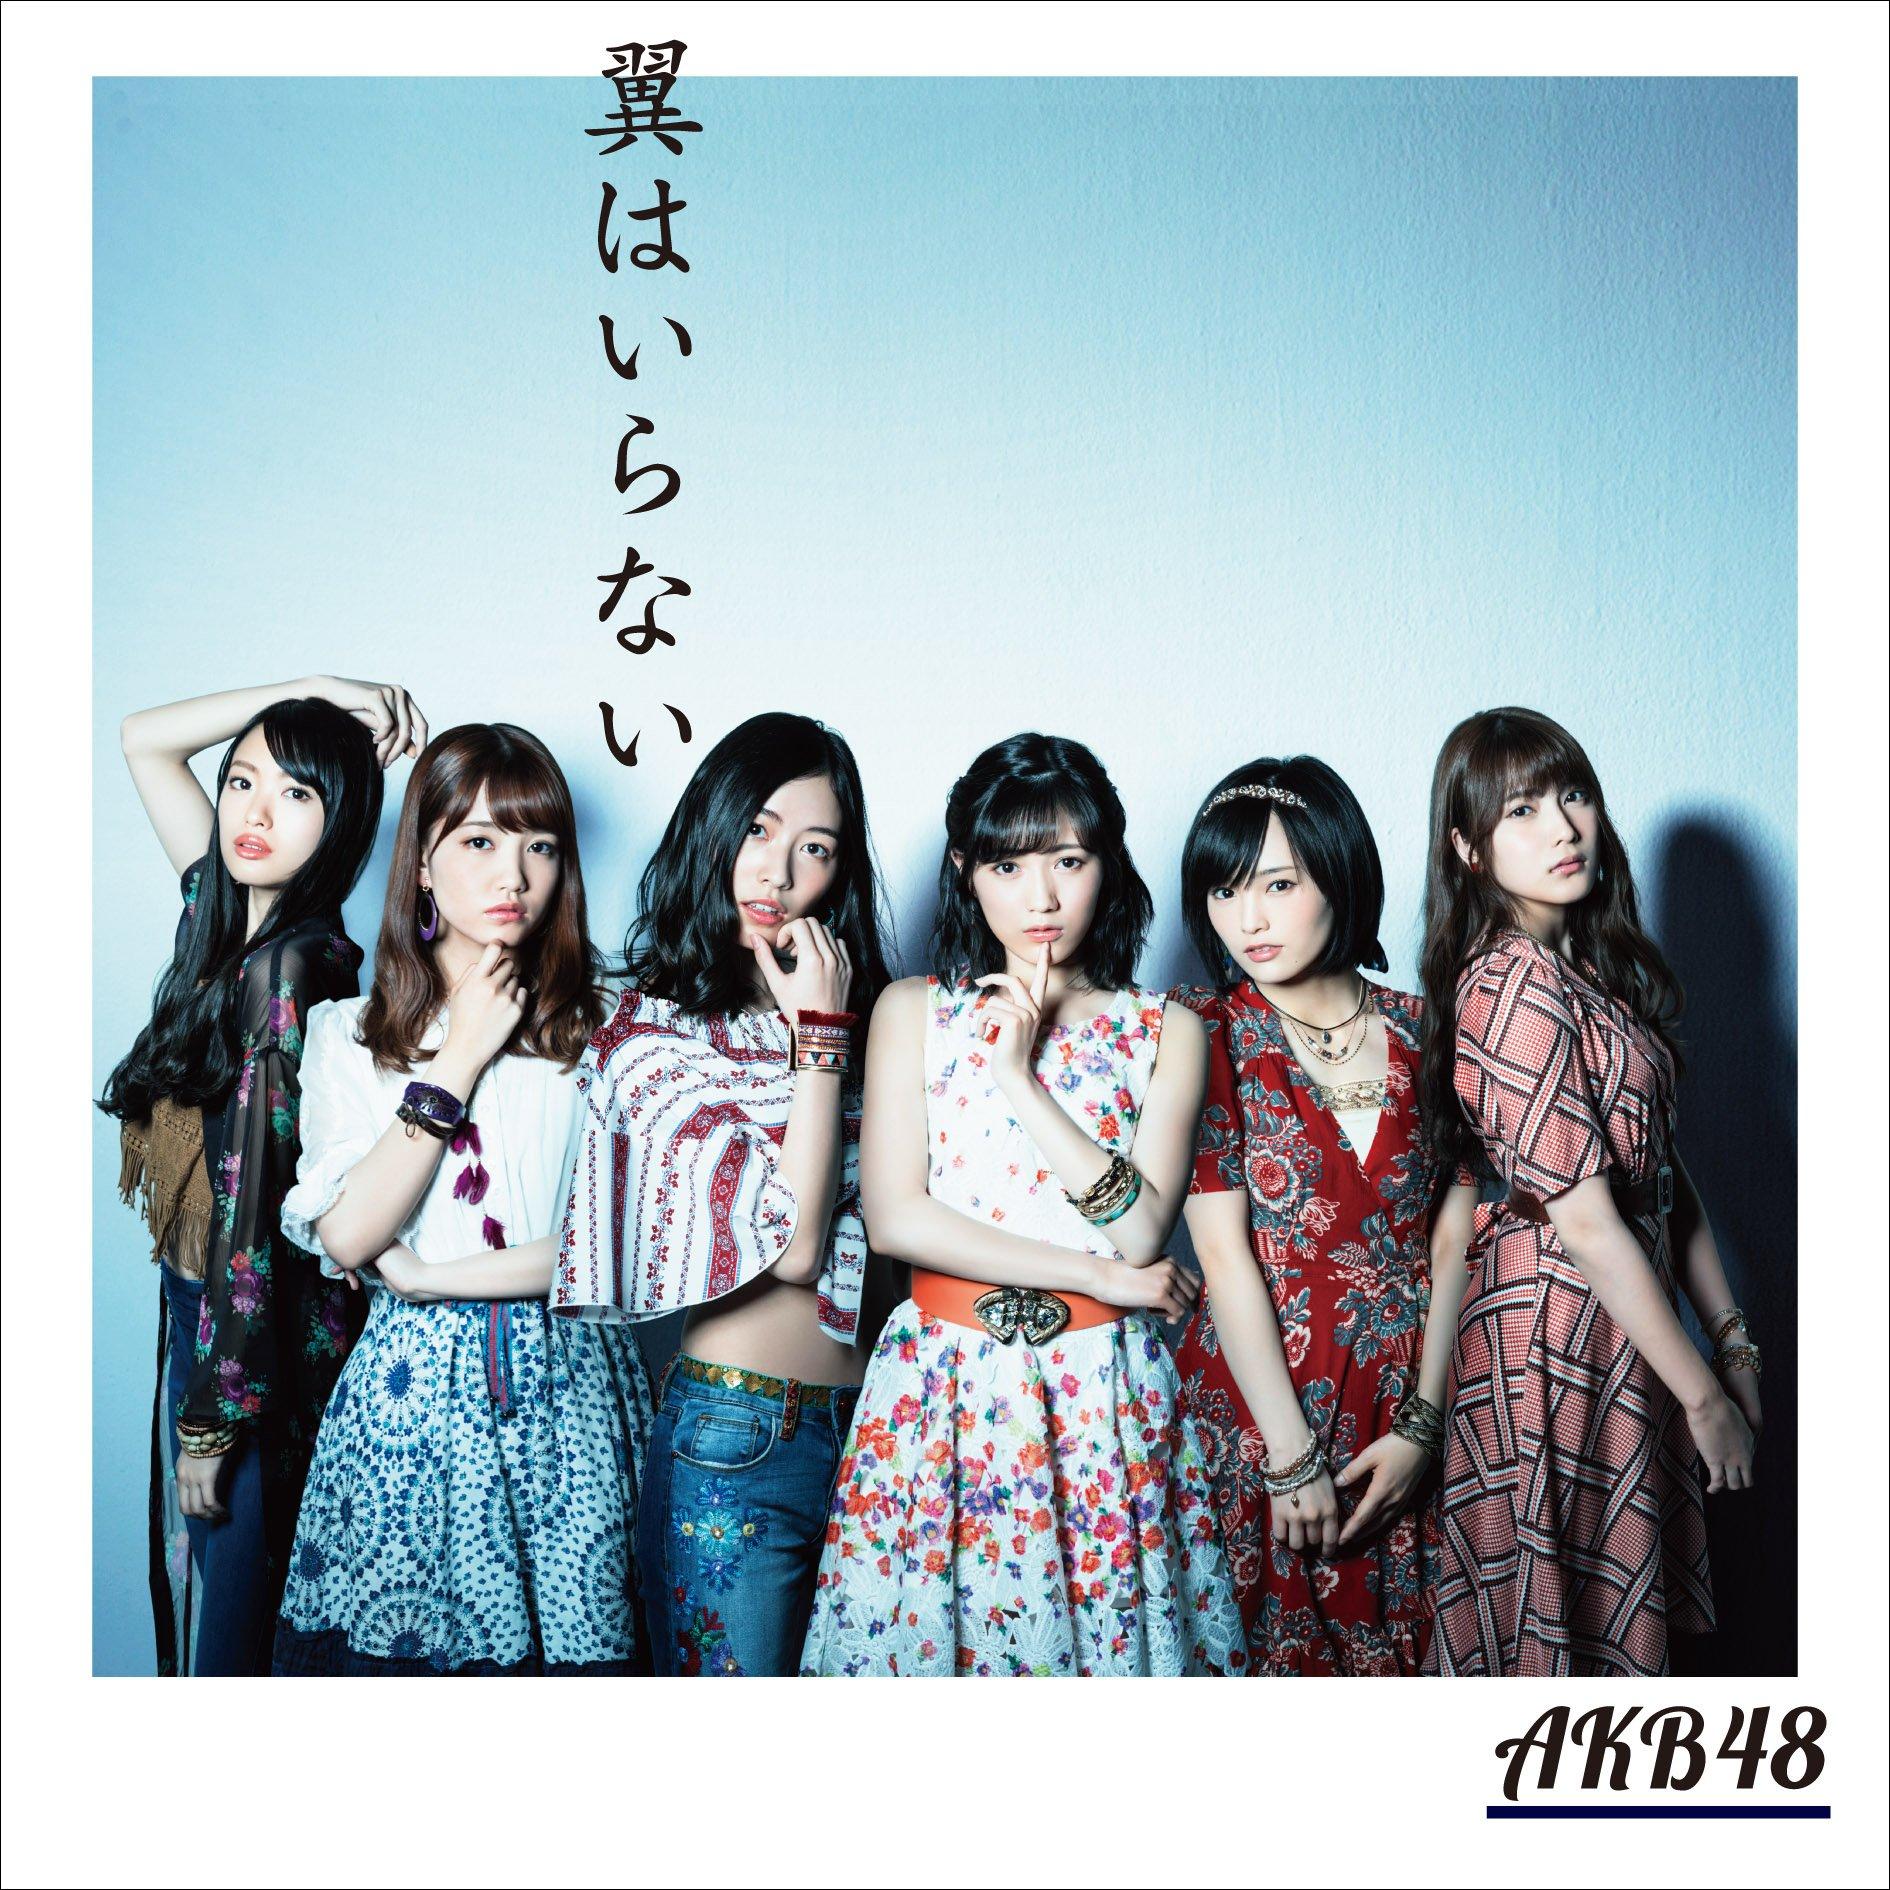 20160808.10.03 AKB48 - Tsubasa wa Iranai (Type A) cover 5.jpg